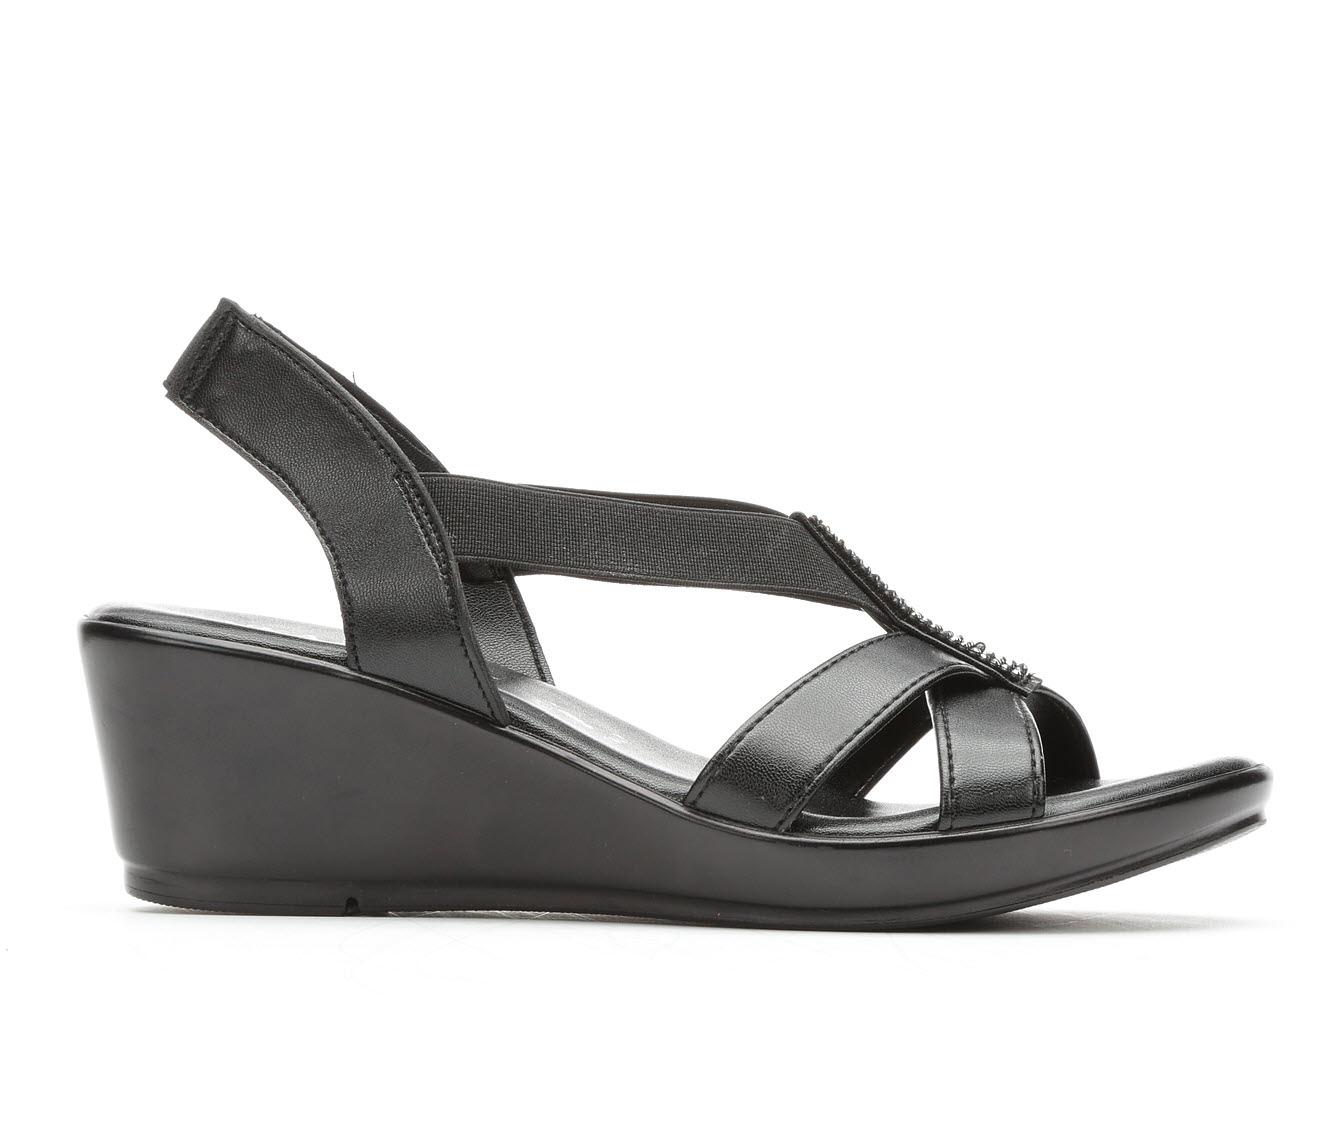 Women's Italian Shoemakers Seek Wedge Sandals (Black)